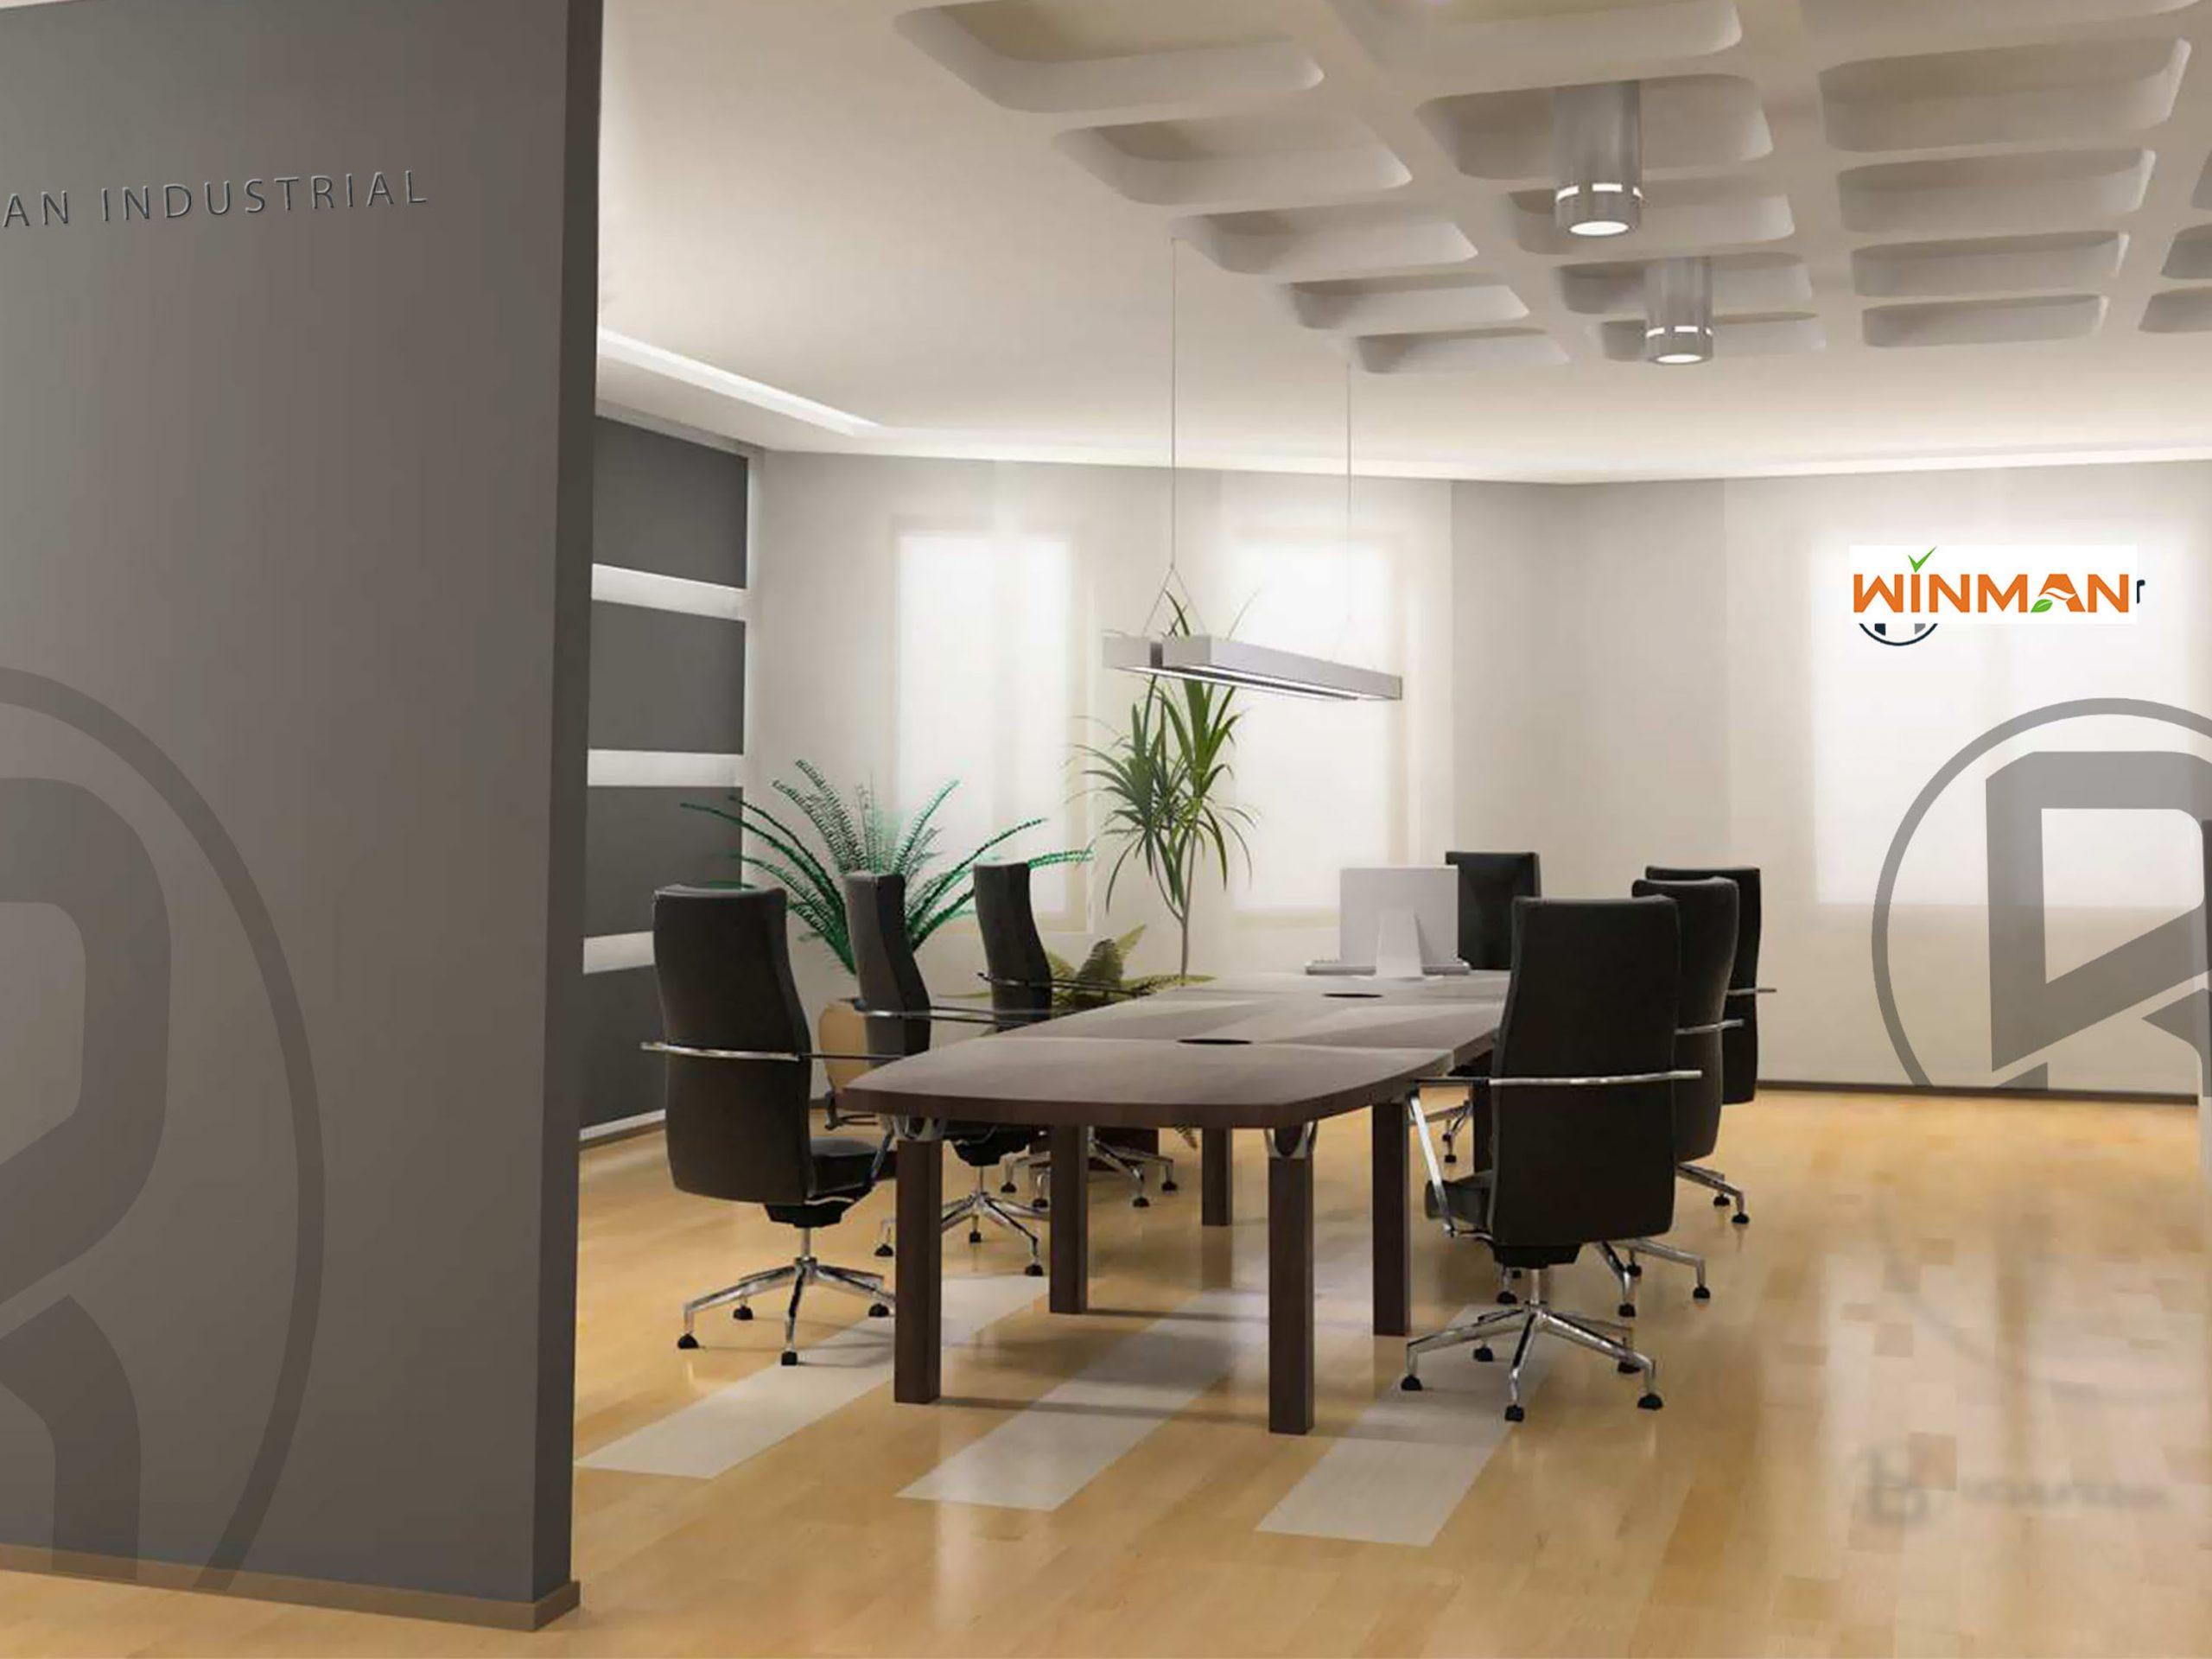 FIPFG Machine WINMAN meeting room